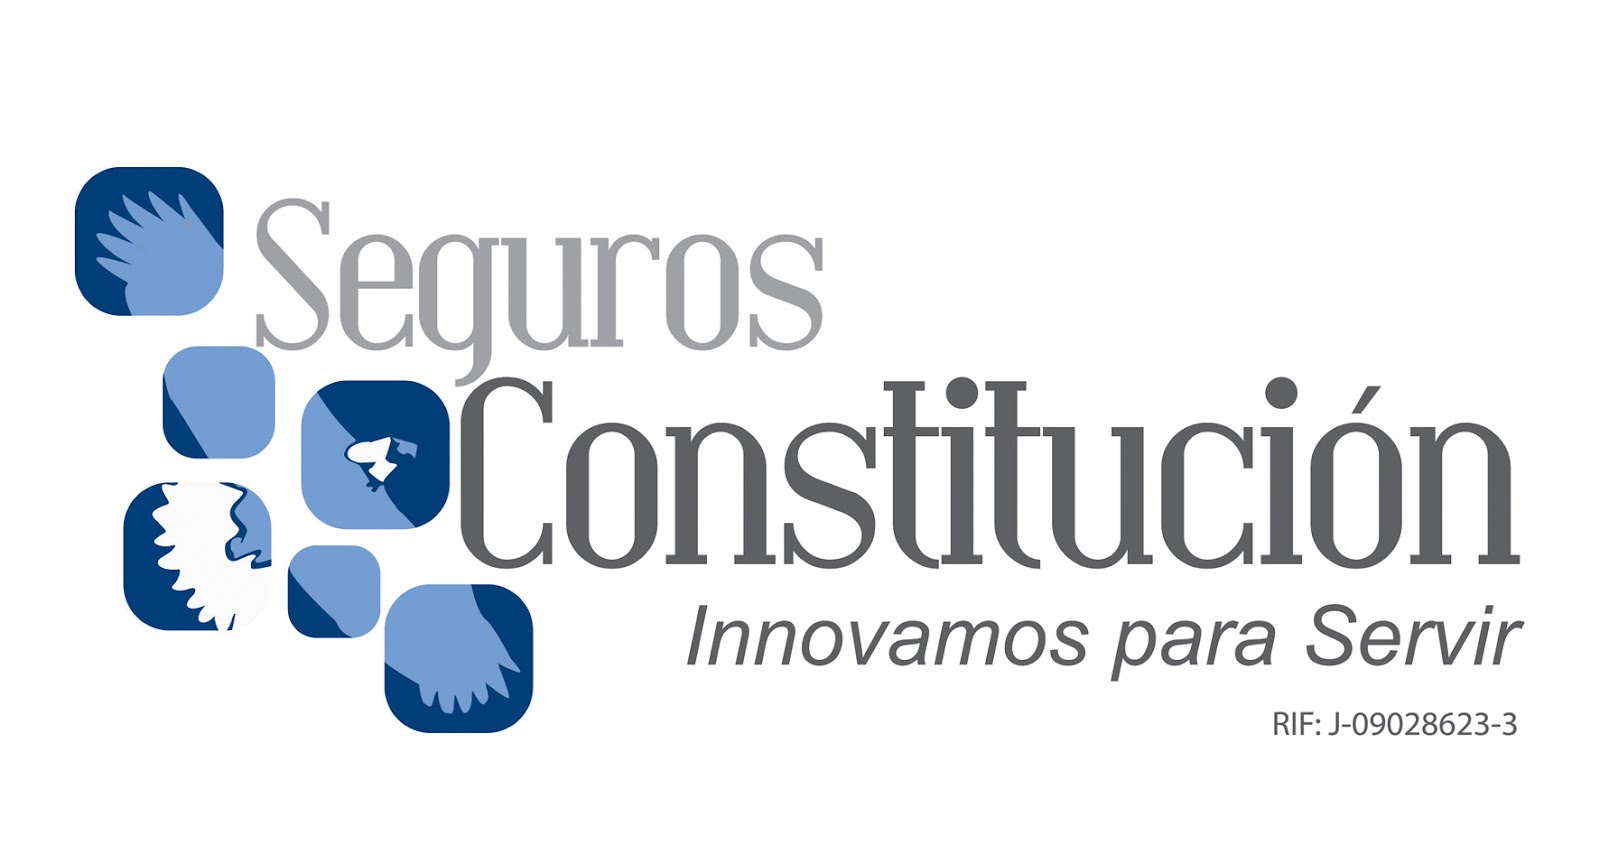 www seguros caracas: